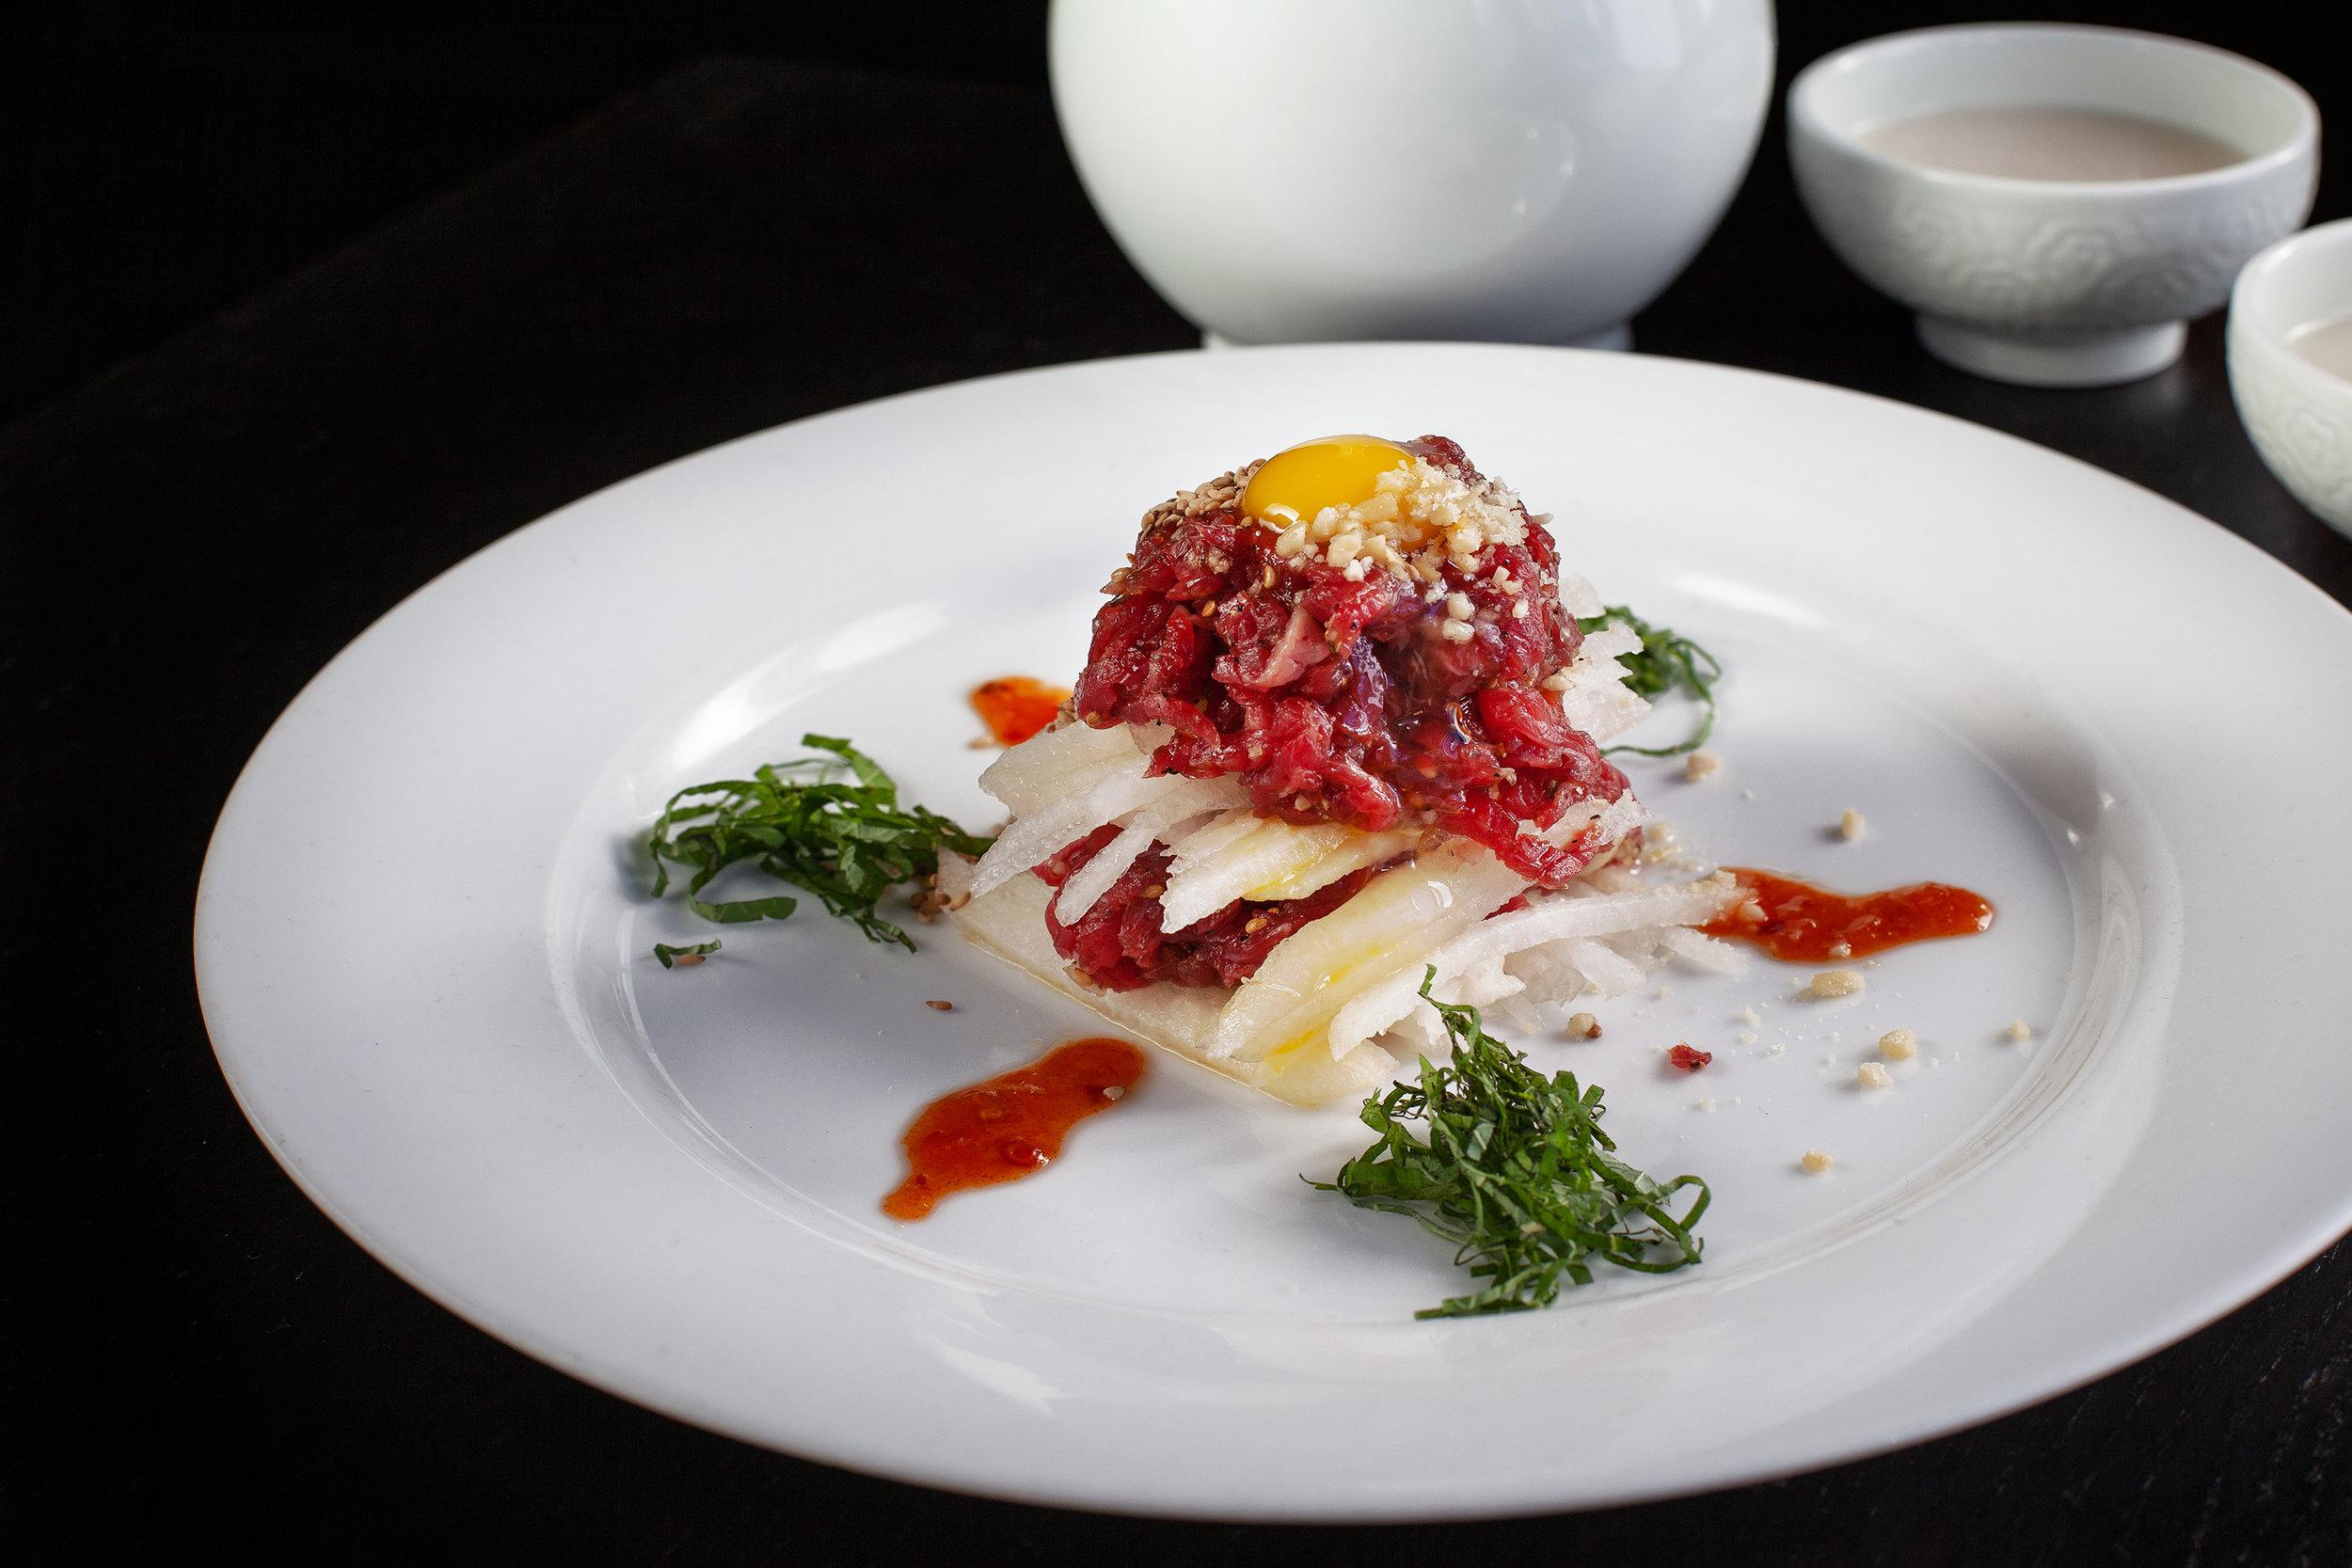 yook hwe - Beef Carpaccio